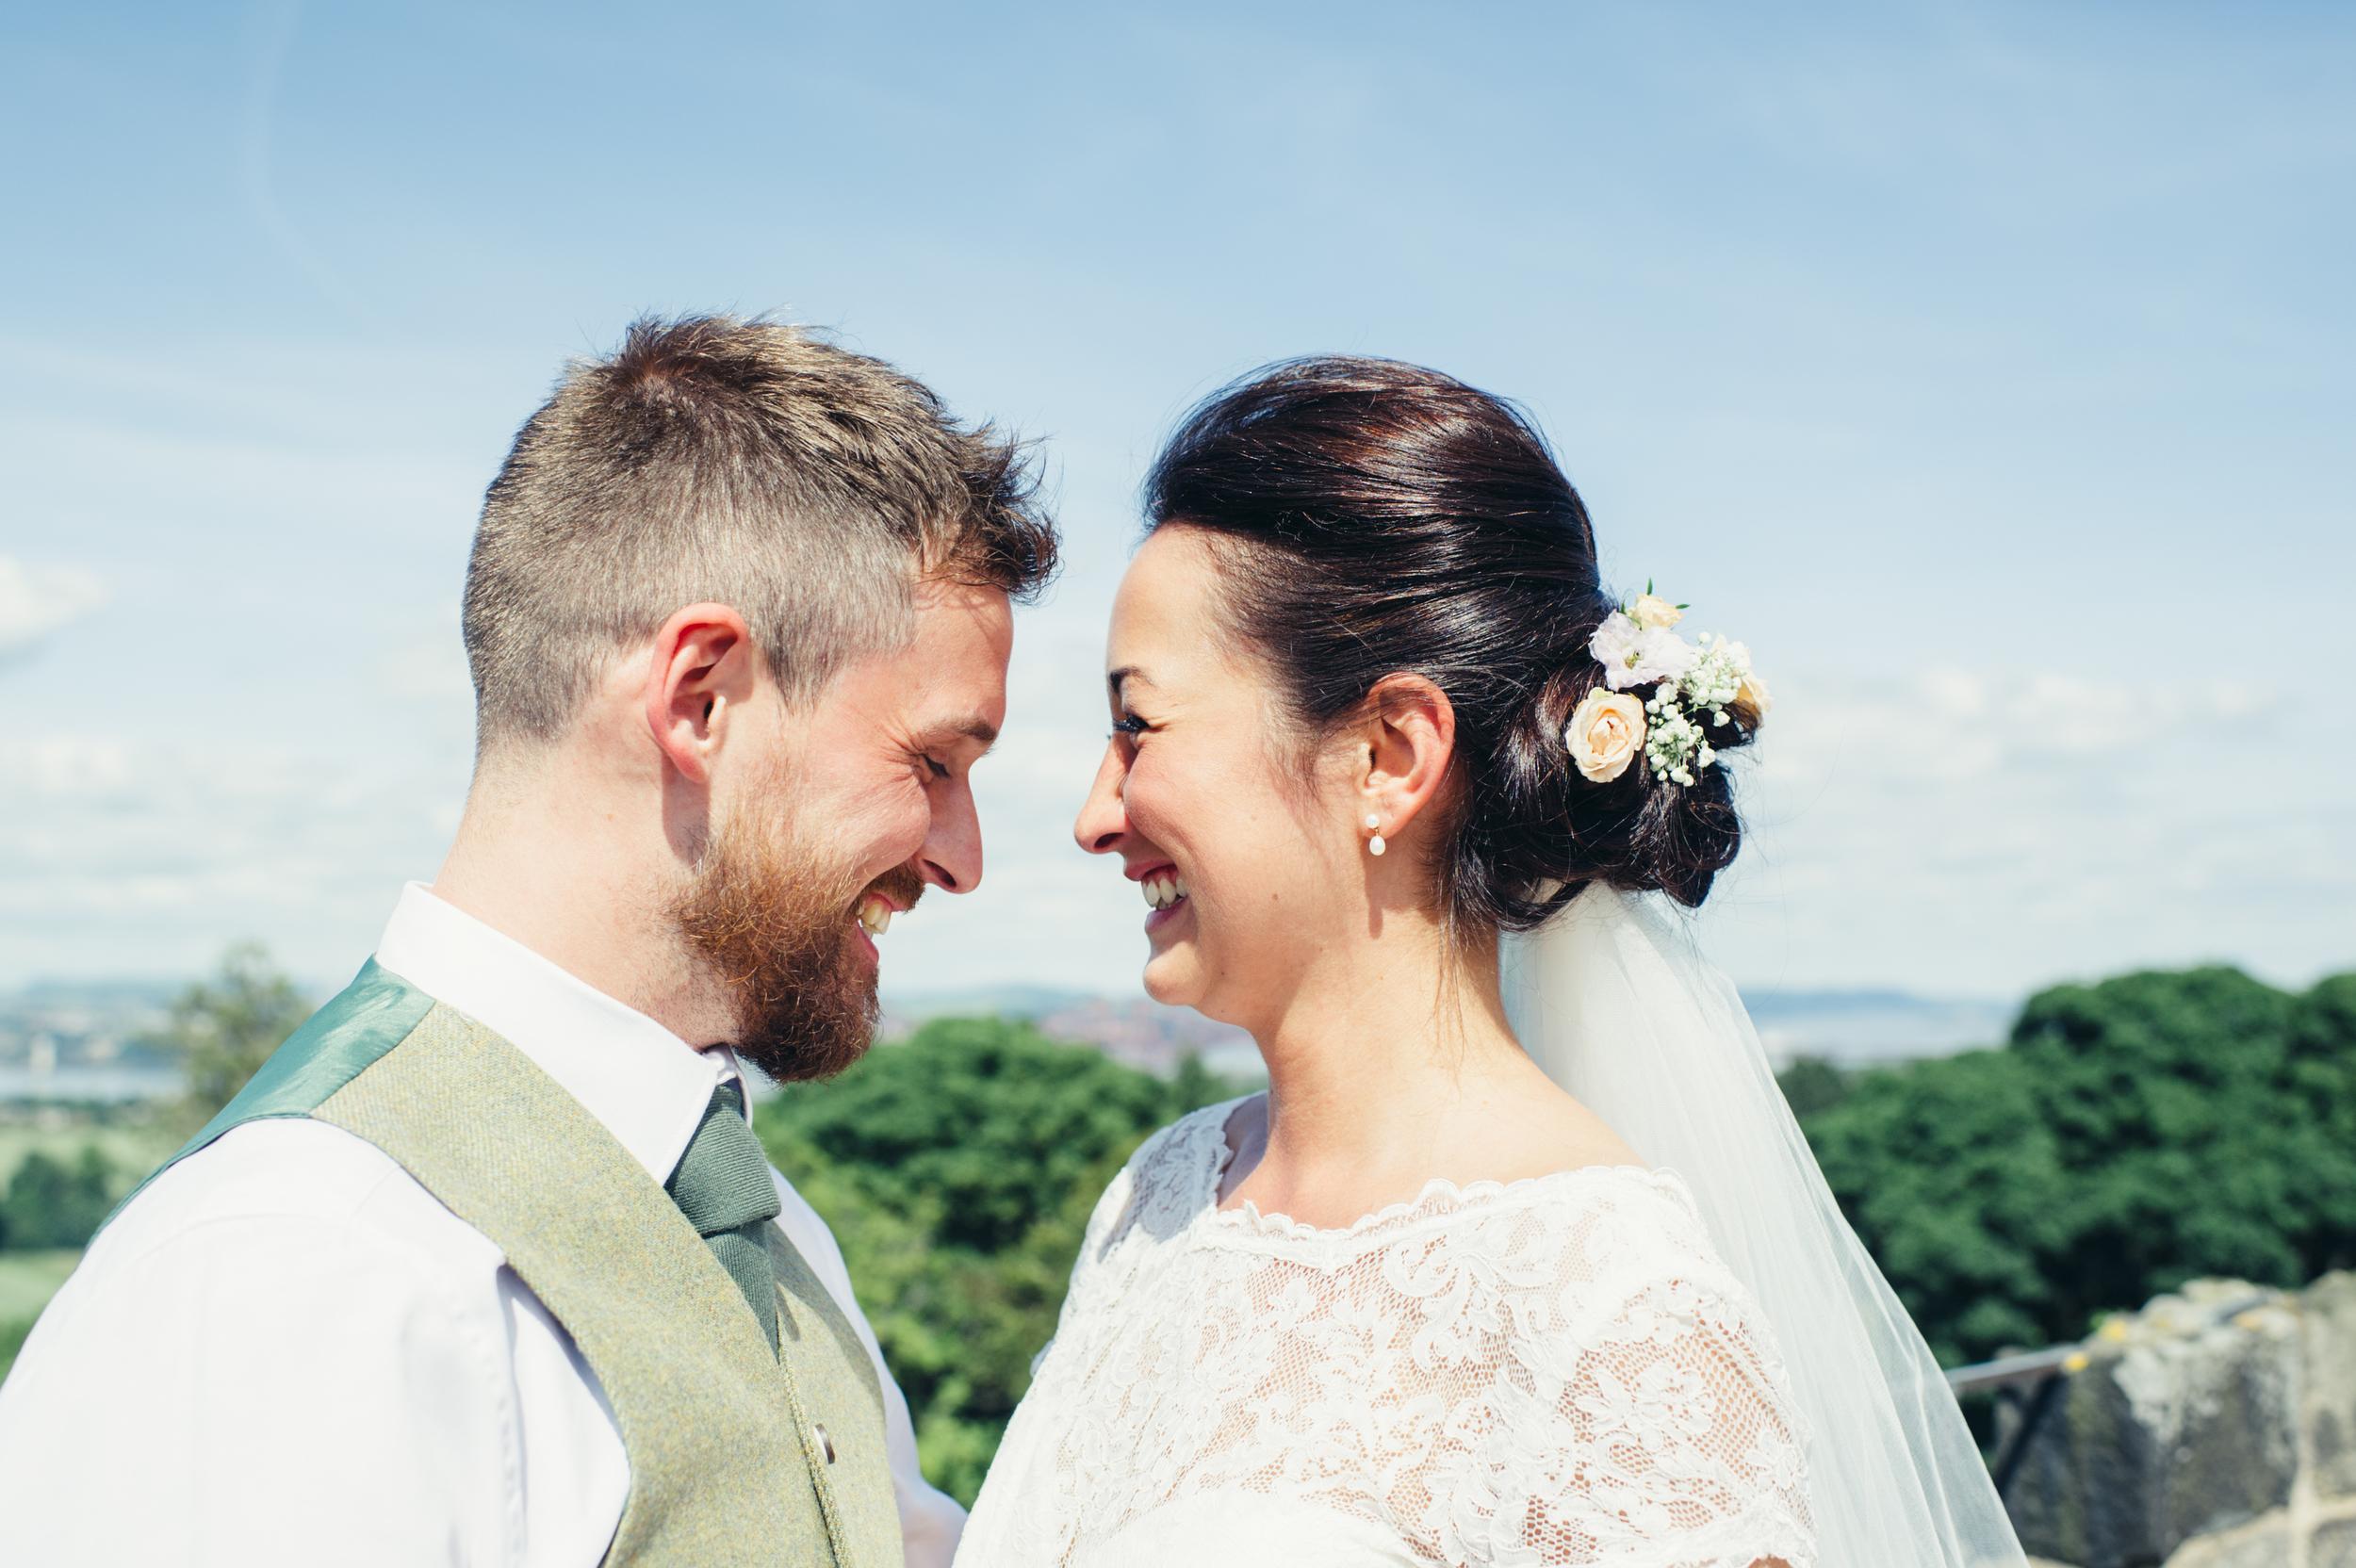 0113-lisa-devine-alternative-creative-wedding-photography-glasgow-edinburgh.JPG